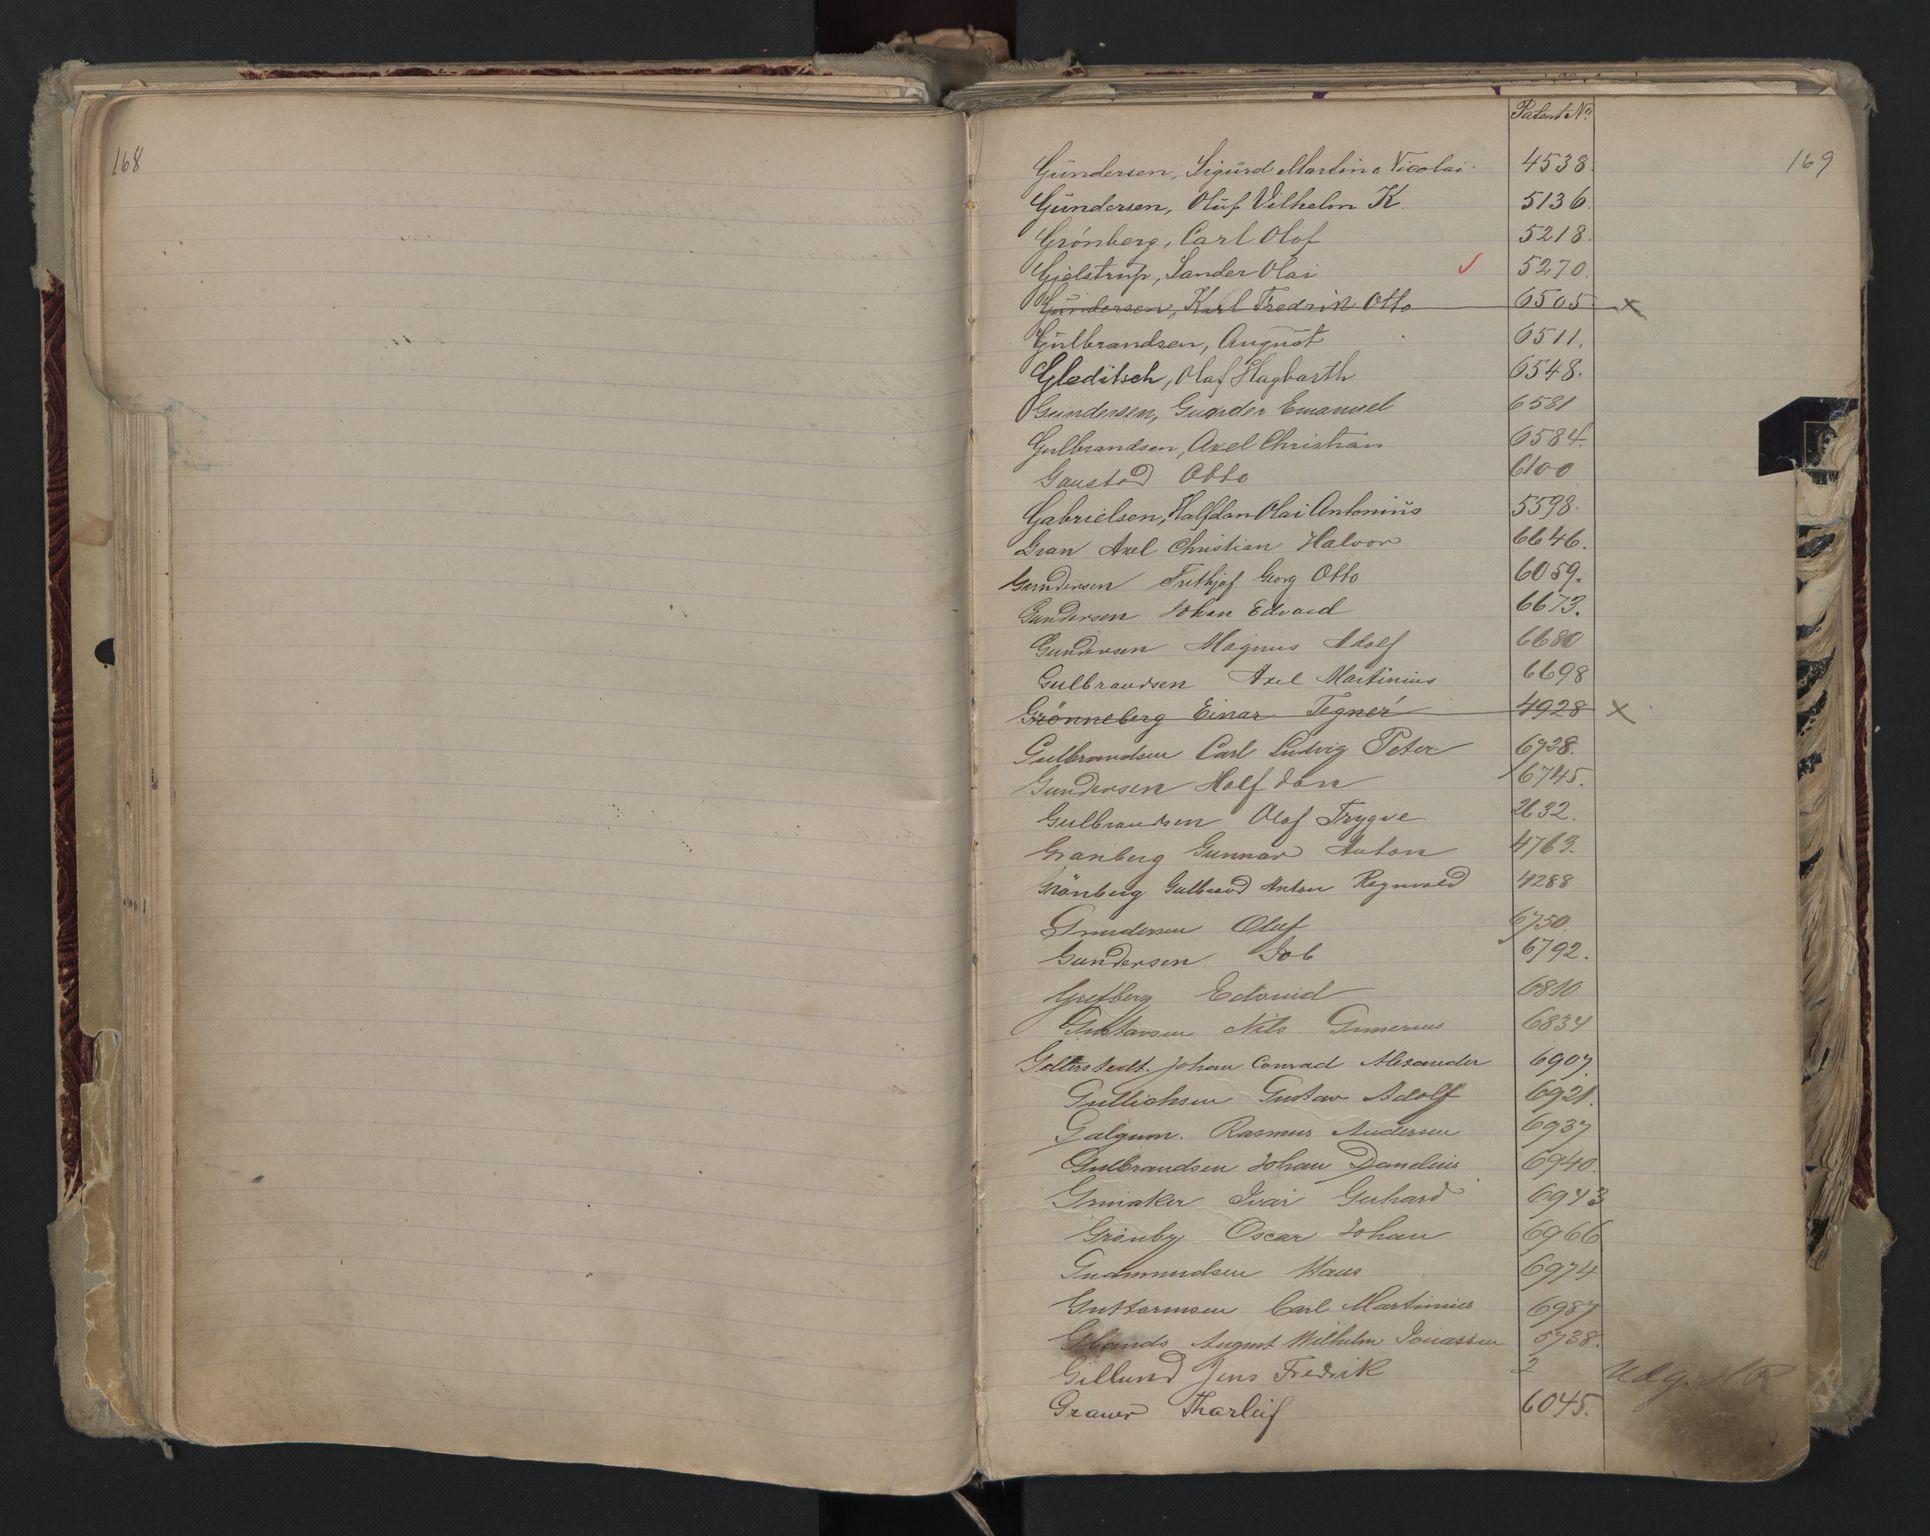 SAO, Oslo sjømannskontor, F/Fa/L0002: Register for Kristiania krets, 1866-1930, s. 168-169